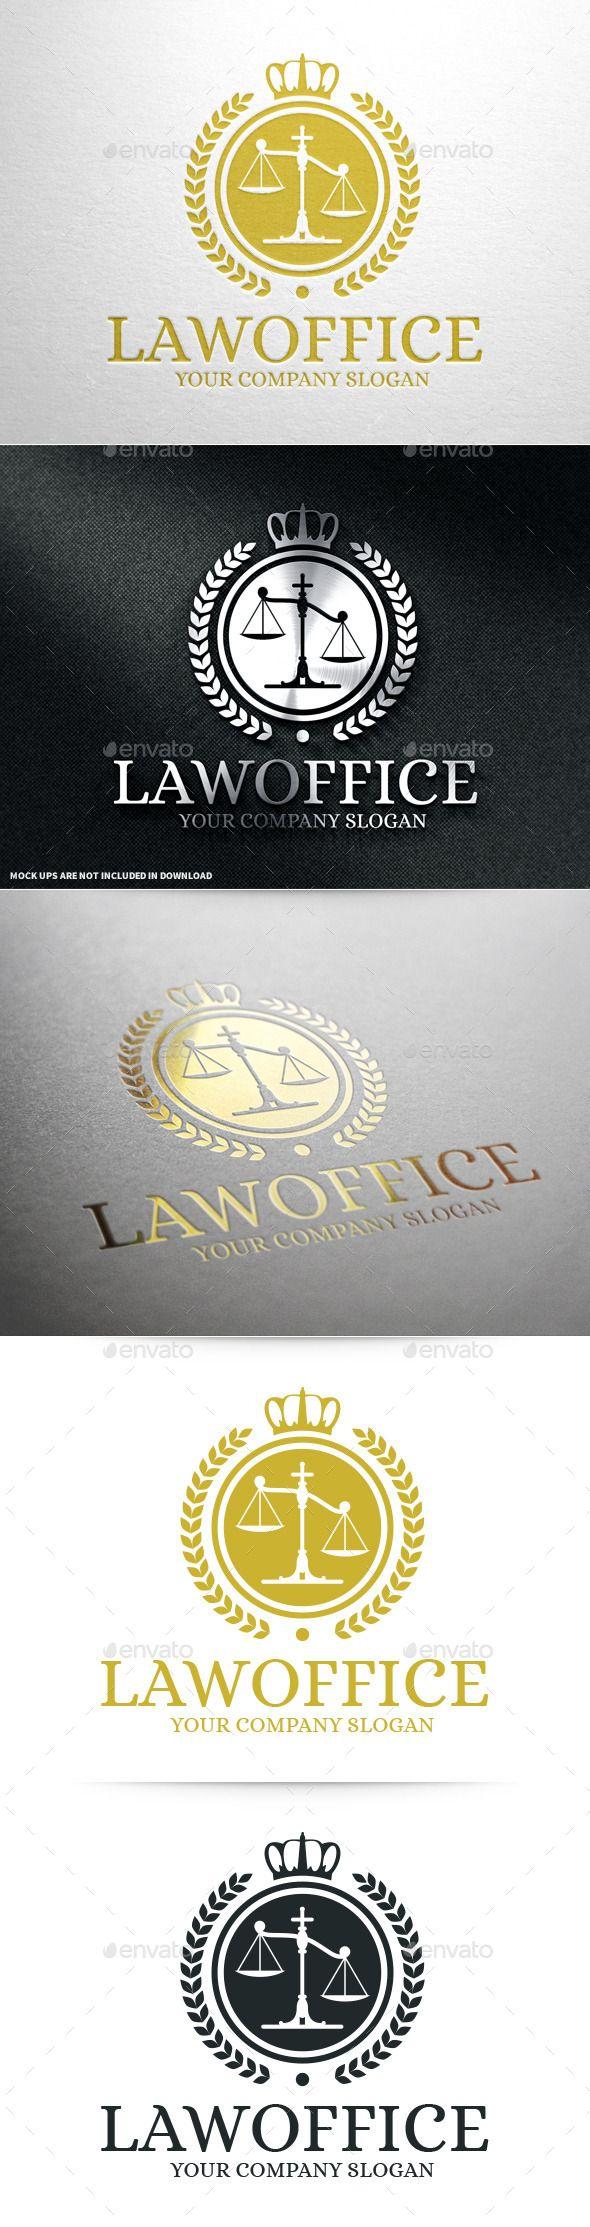 Law Office Logo Template v2 10 best